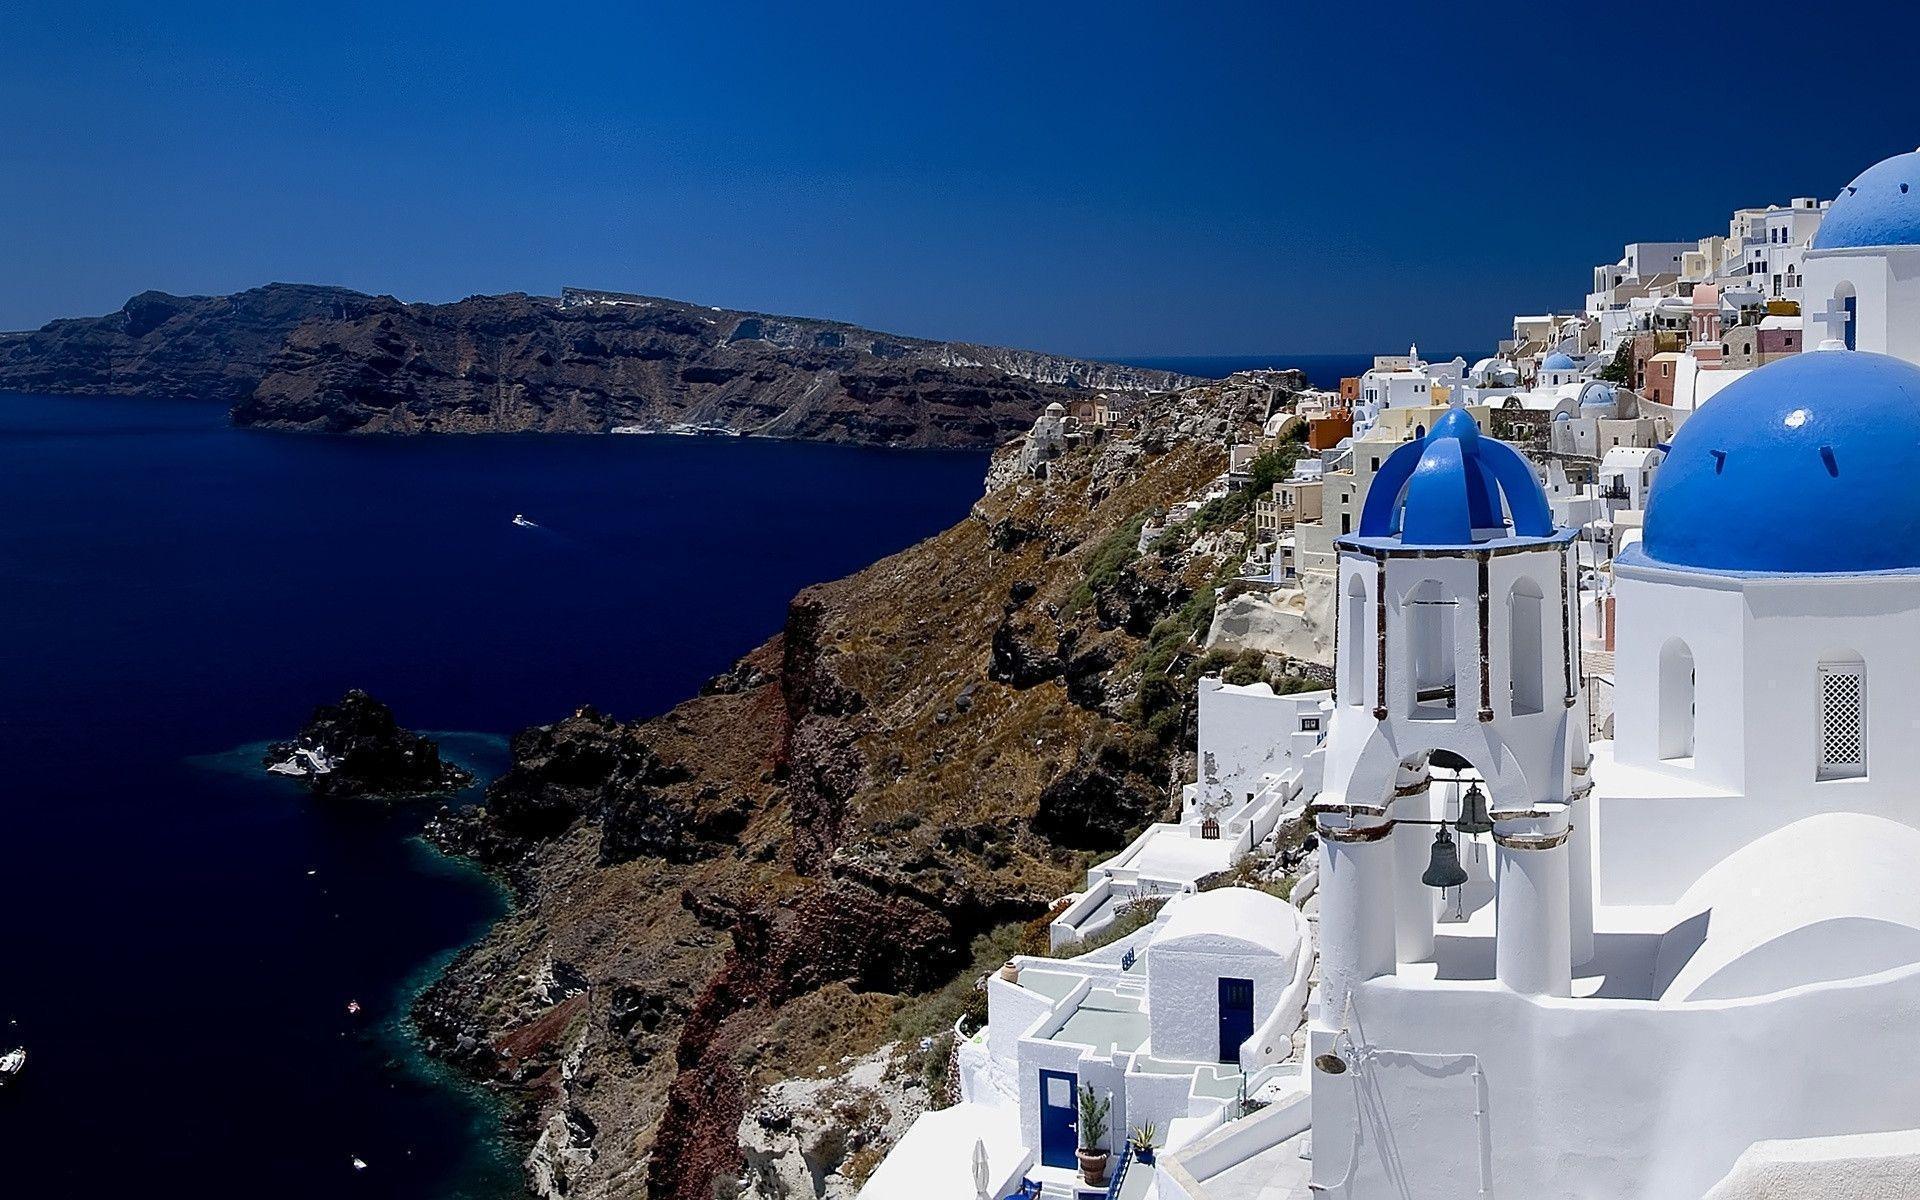 greece wallpapers santorini hd - photo #8